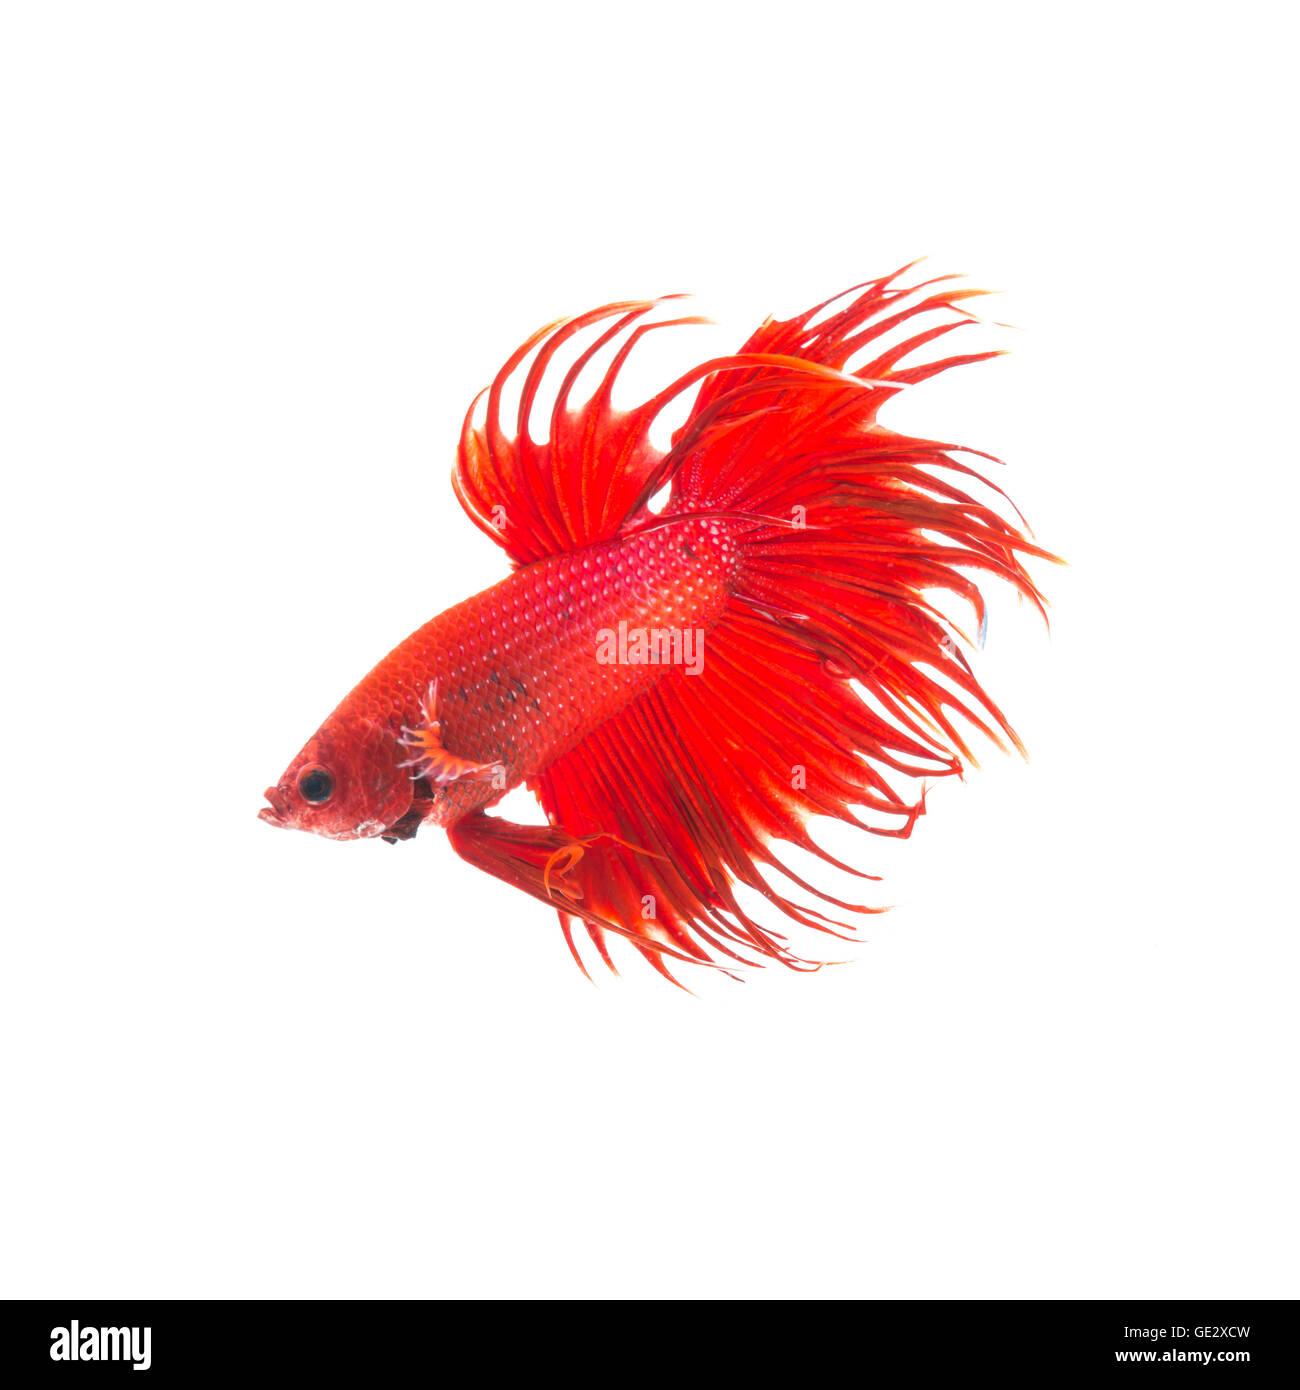 orange red siamese fighting fish, betta splendens isolated on white background Stock Photo